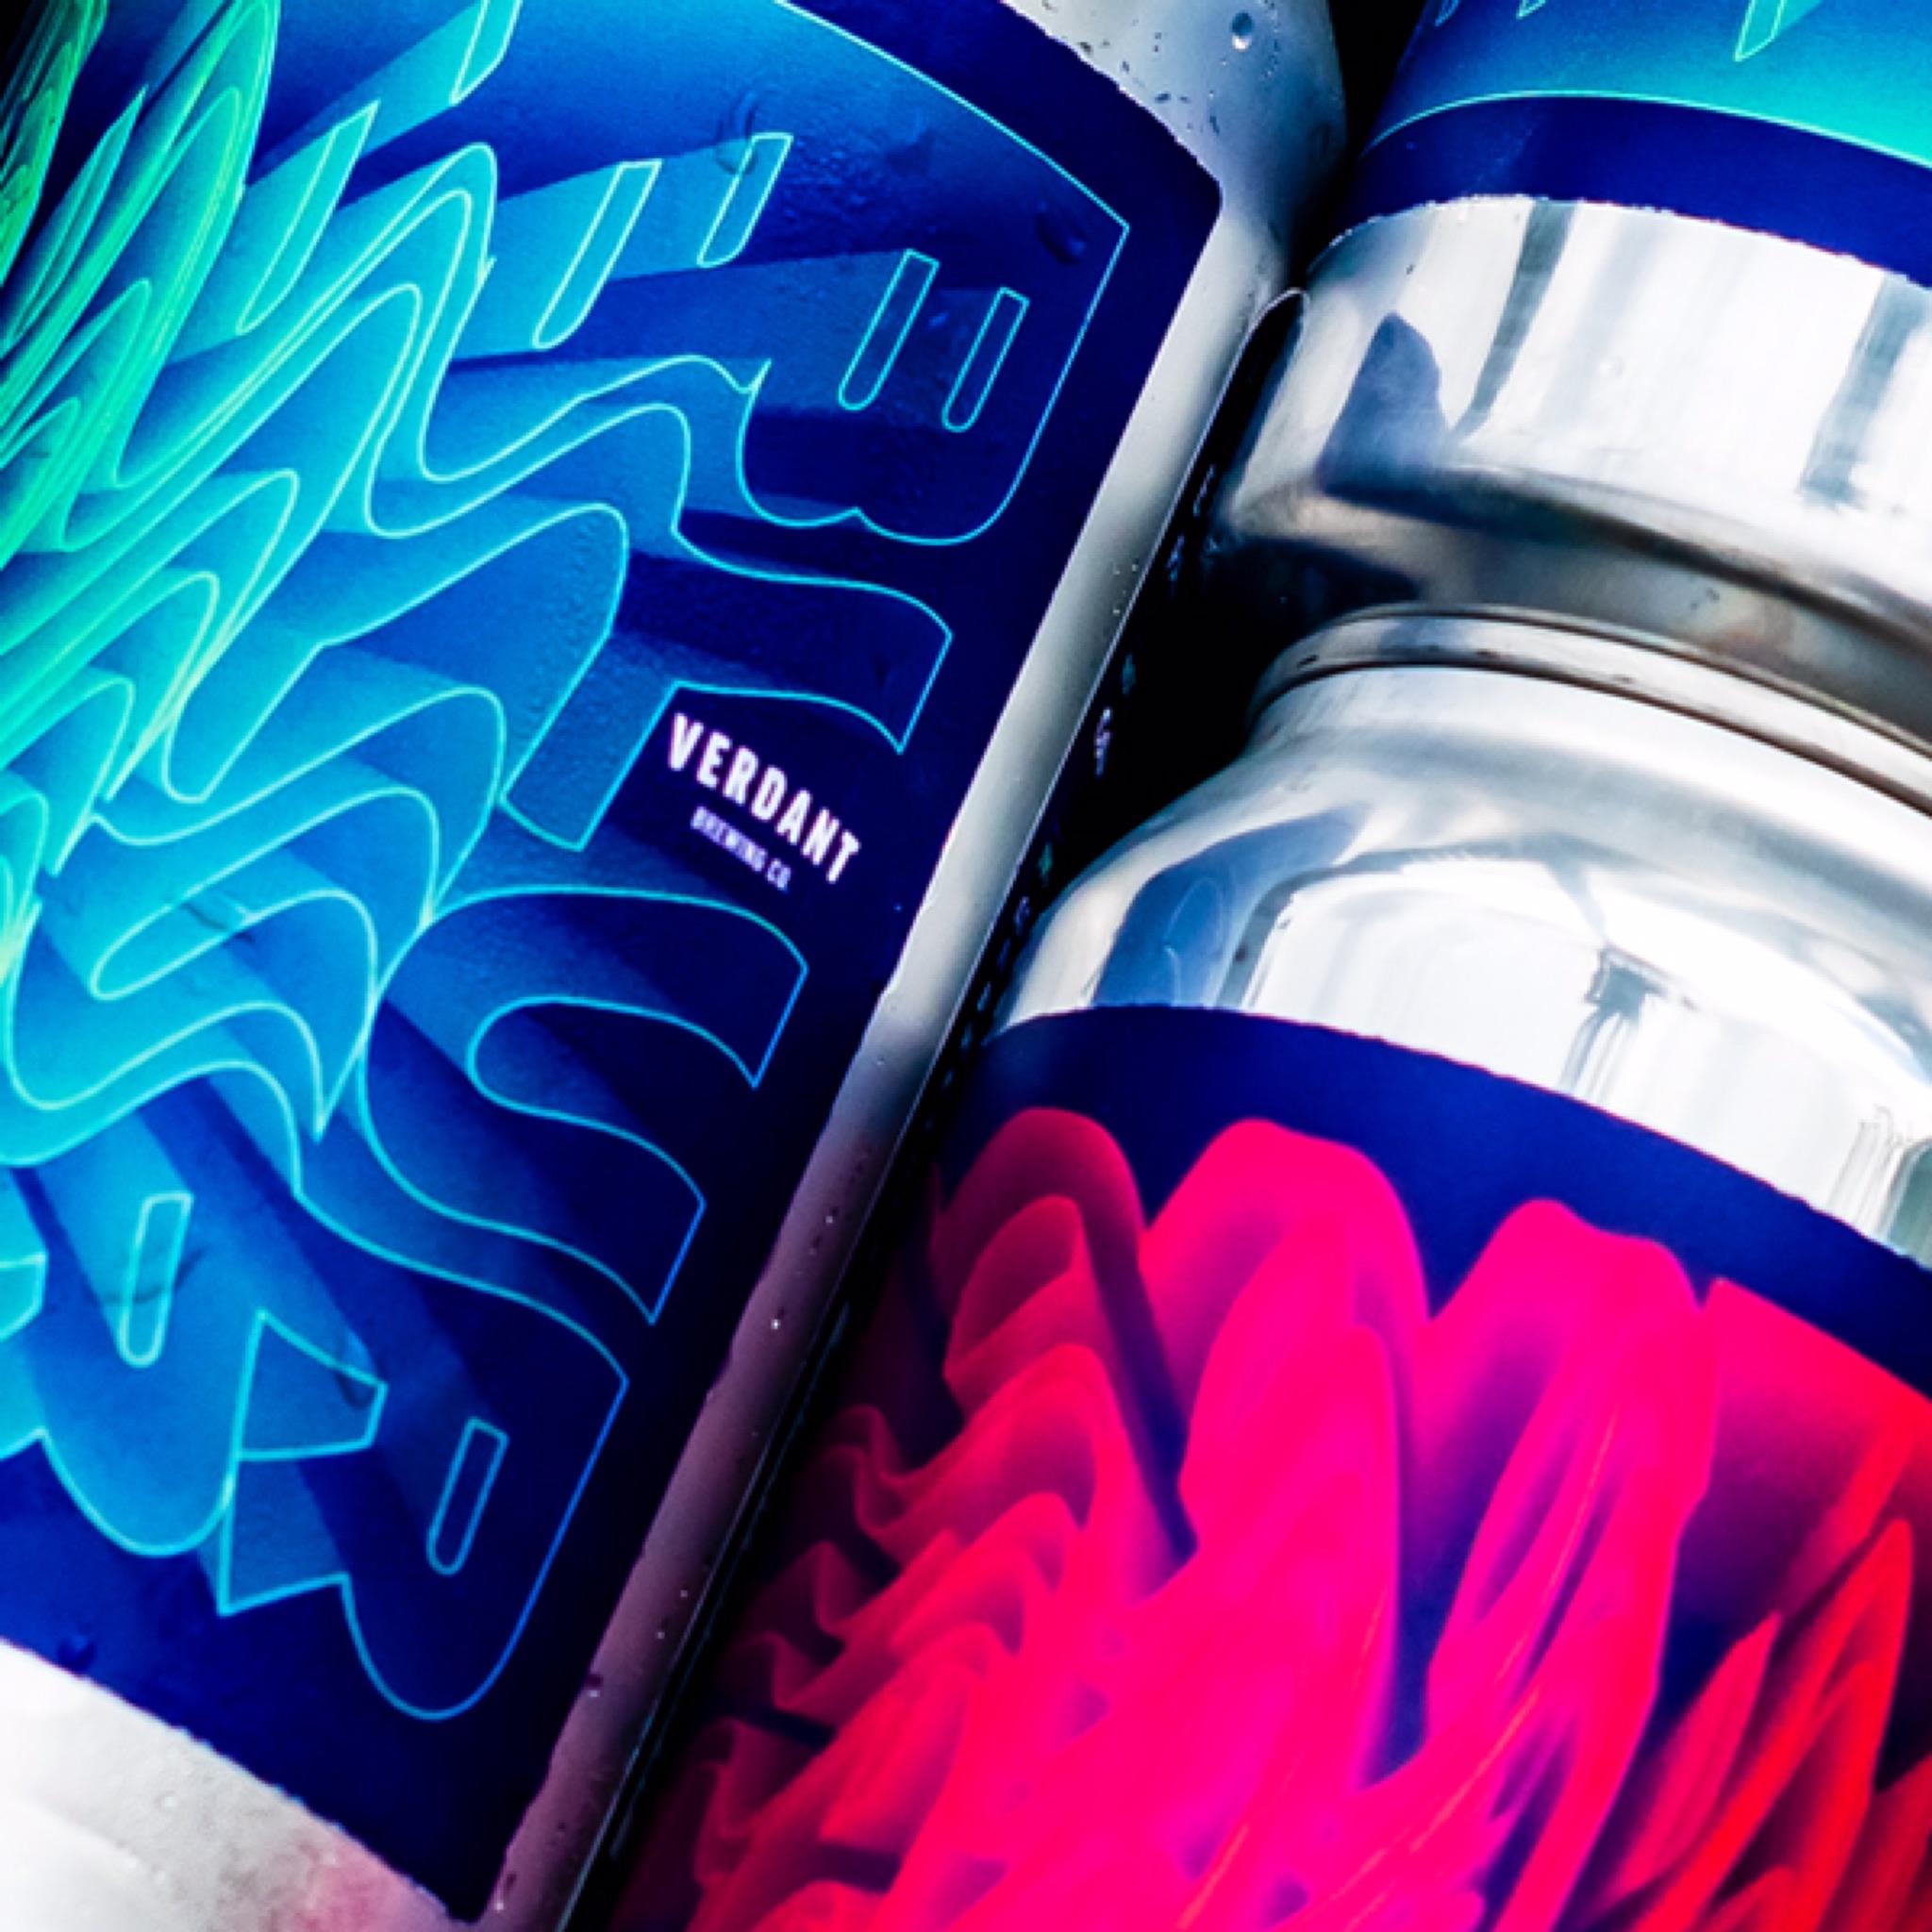 Blended Blur - Pale Ale 4.8% 440ml Verdant Brewing